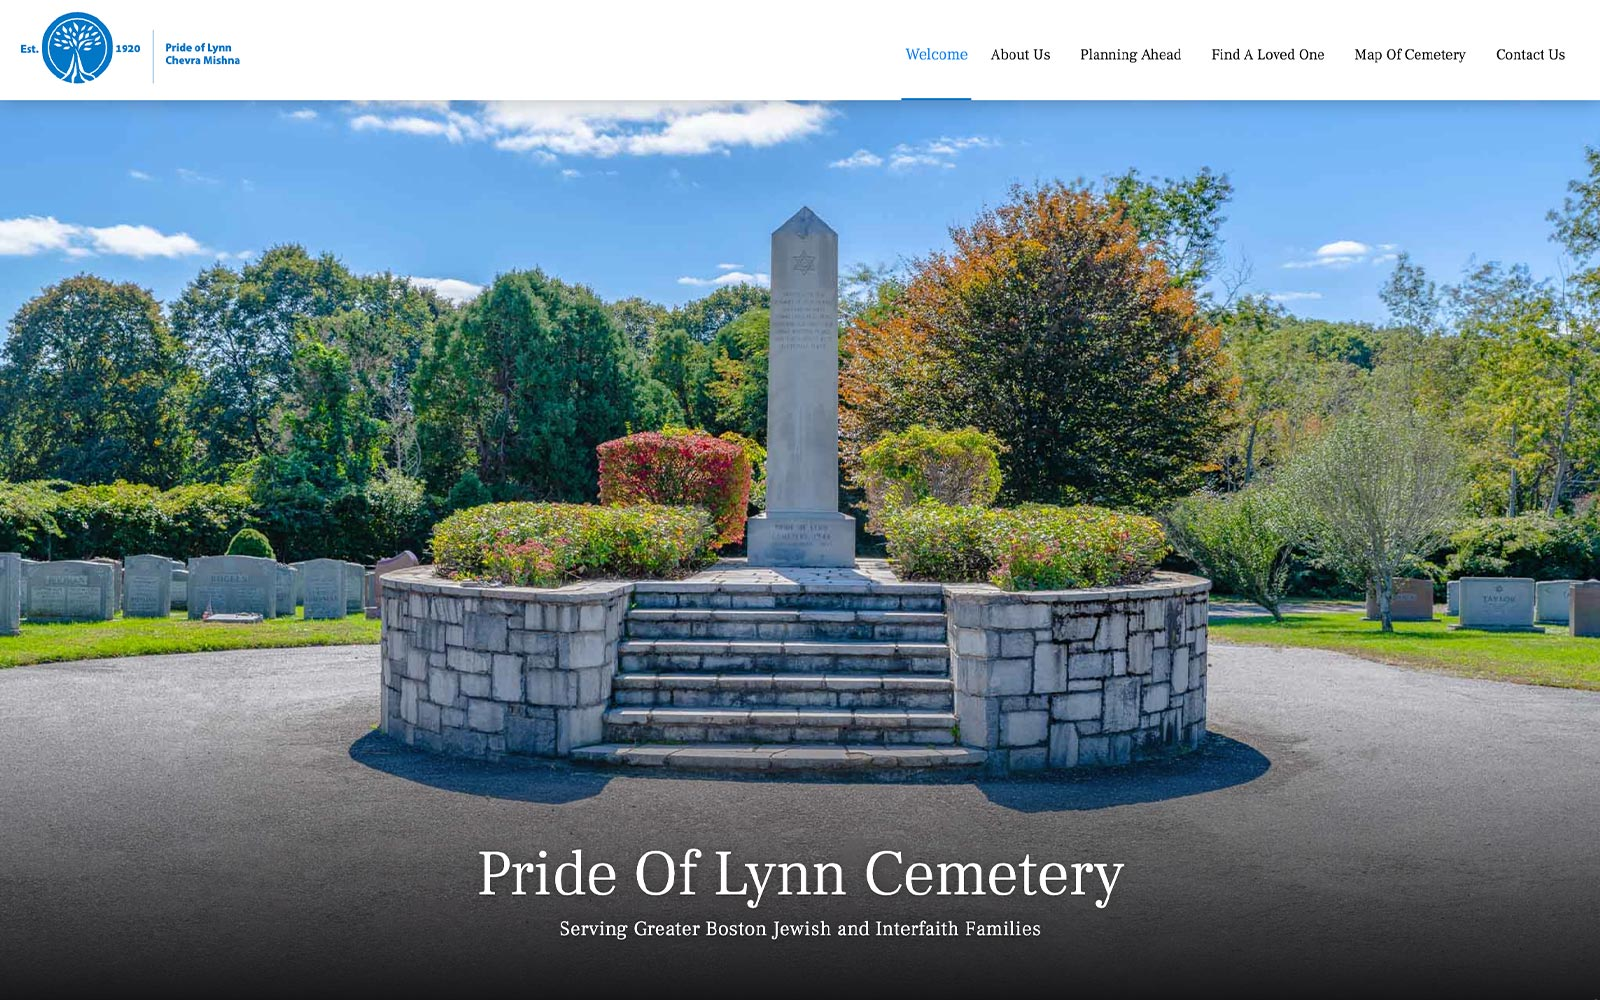 Pride of Lynn Cemetery